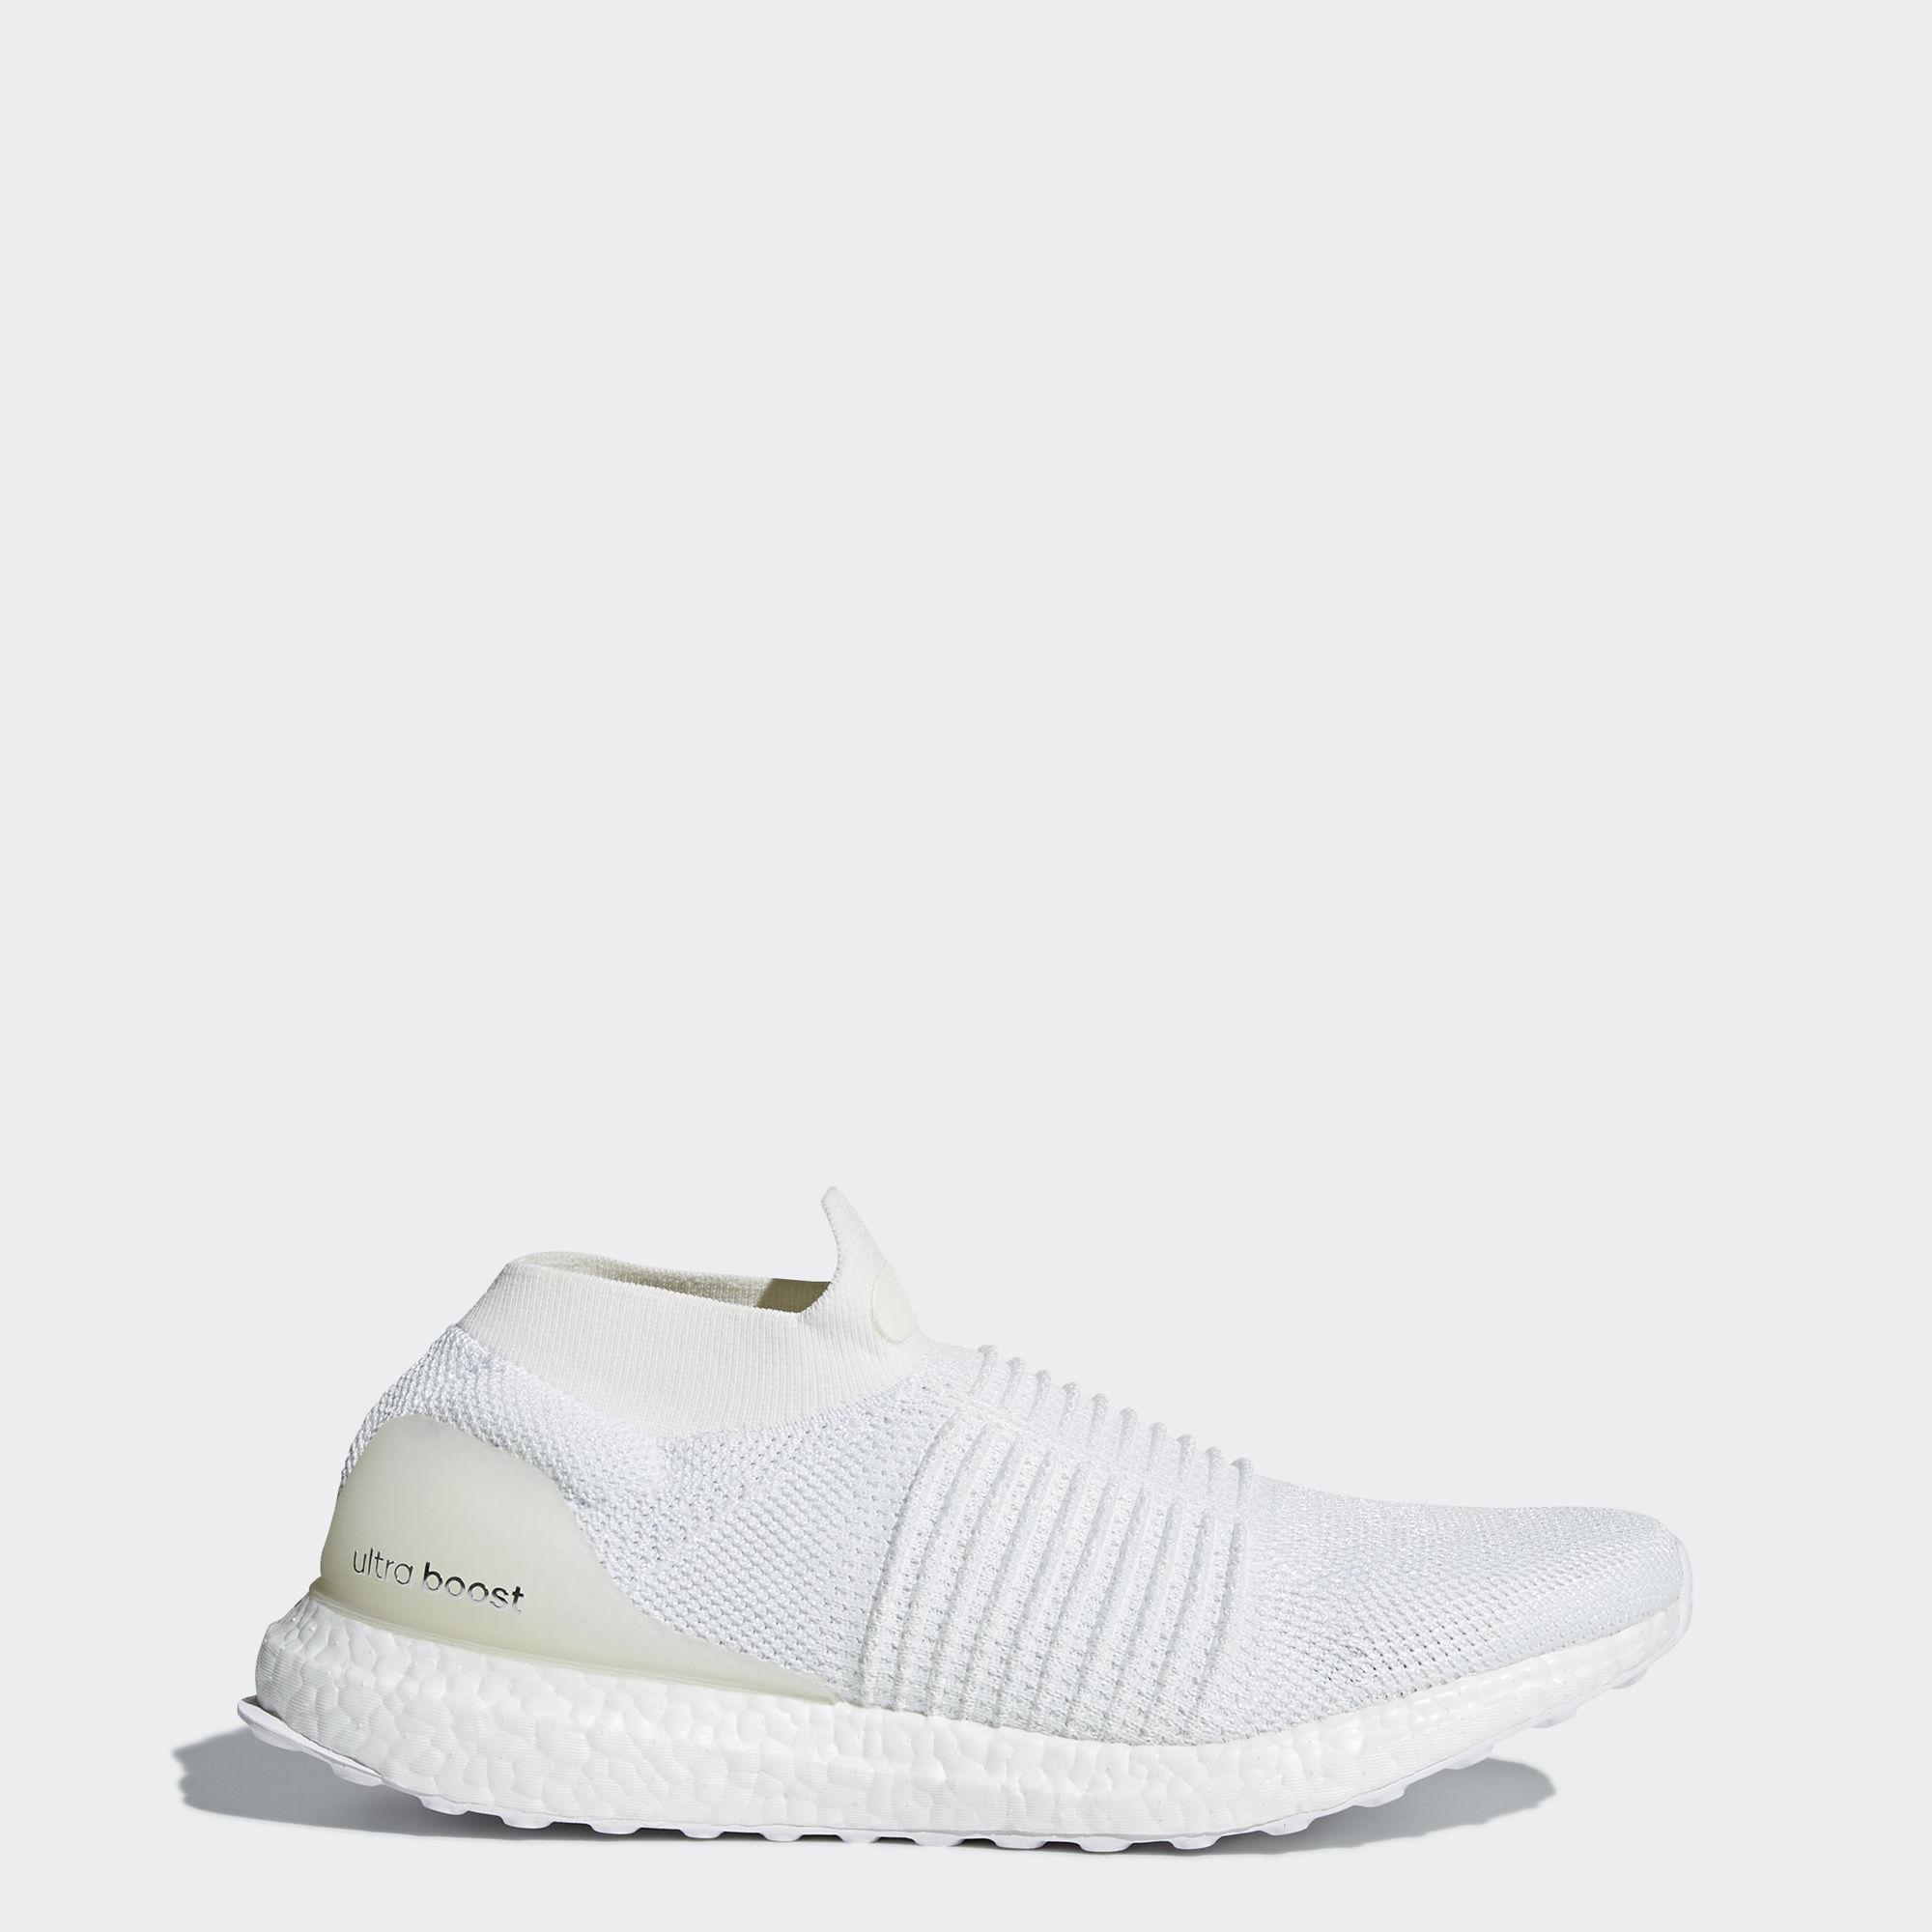 7e93c3495 adidas Men s Ultraboost Laceless Running Shoes (White)  80   eBay -  Slickdeals.net